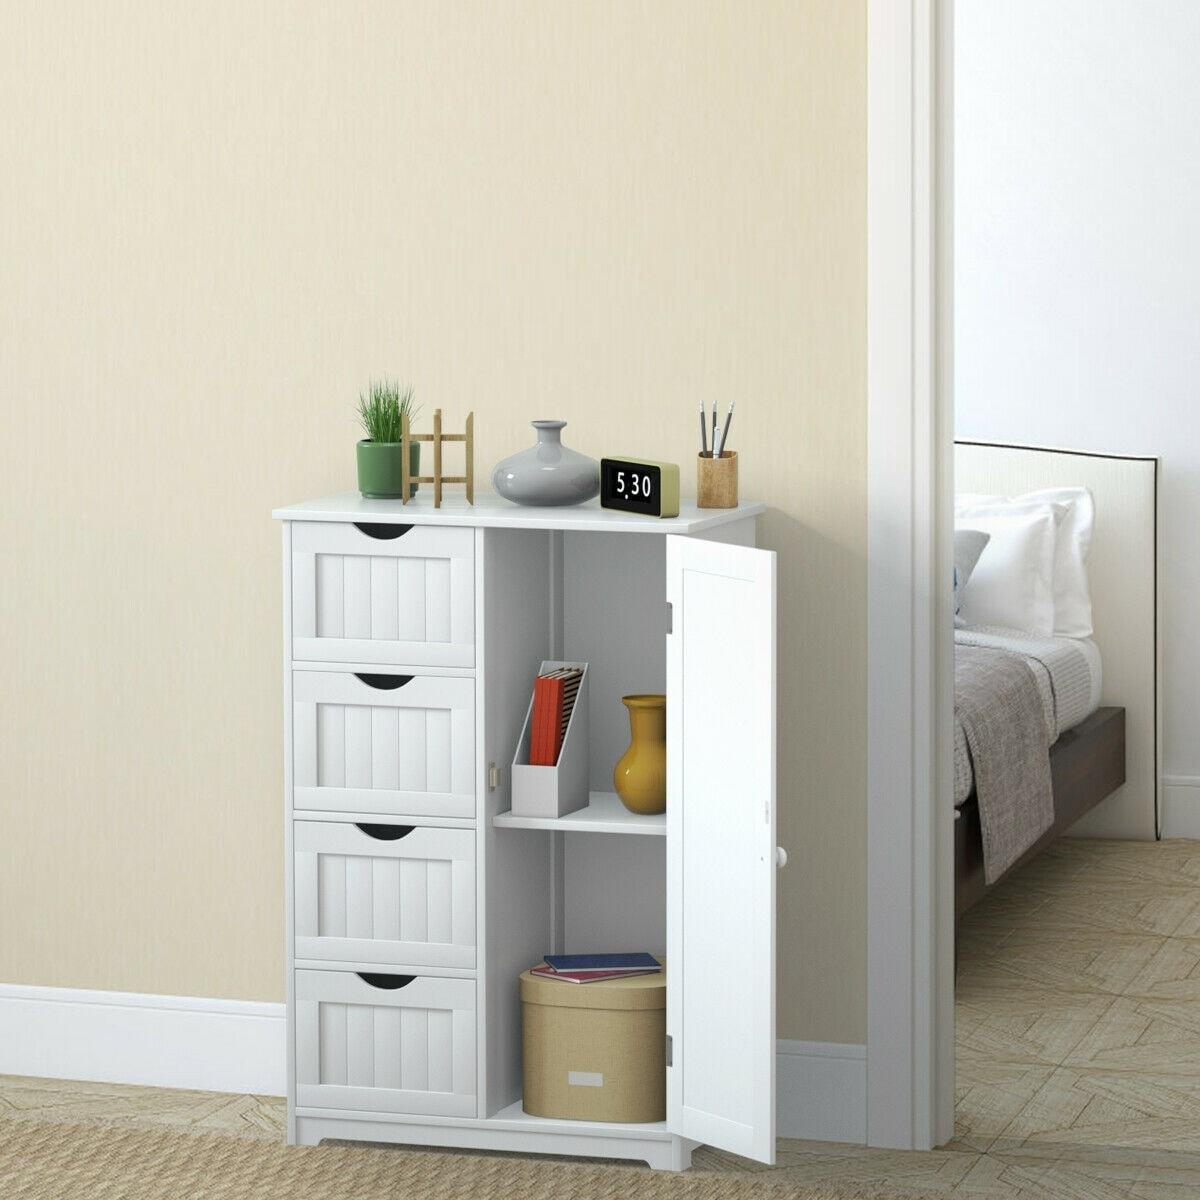 Picture of: Grey Wooden 1 Drawer 1 Door Freestanding Bathroom Cabinet Cupboard Storage Unit Cabinets Cupboards Home Furniture Diy Plastpath Com Br